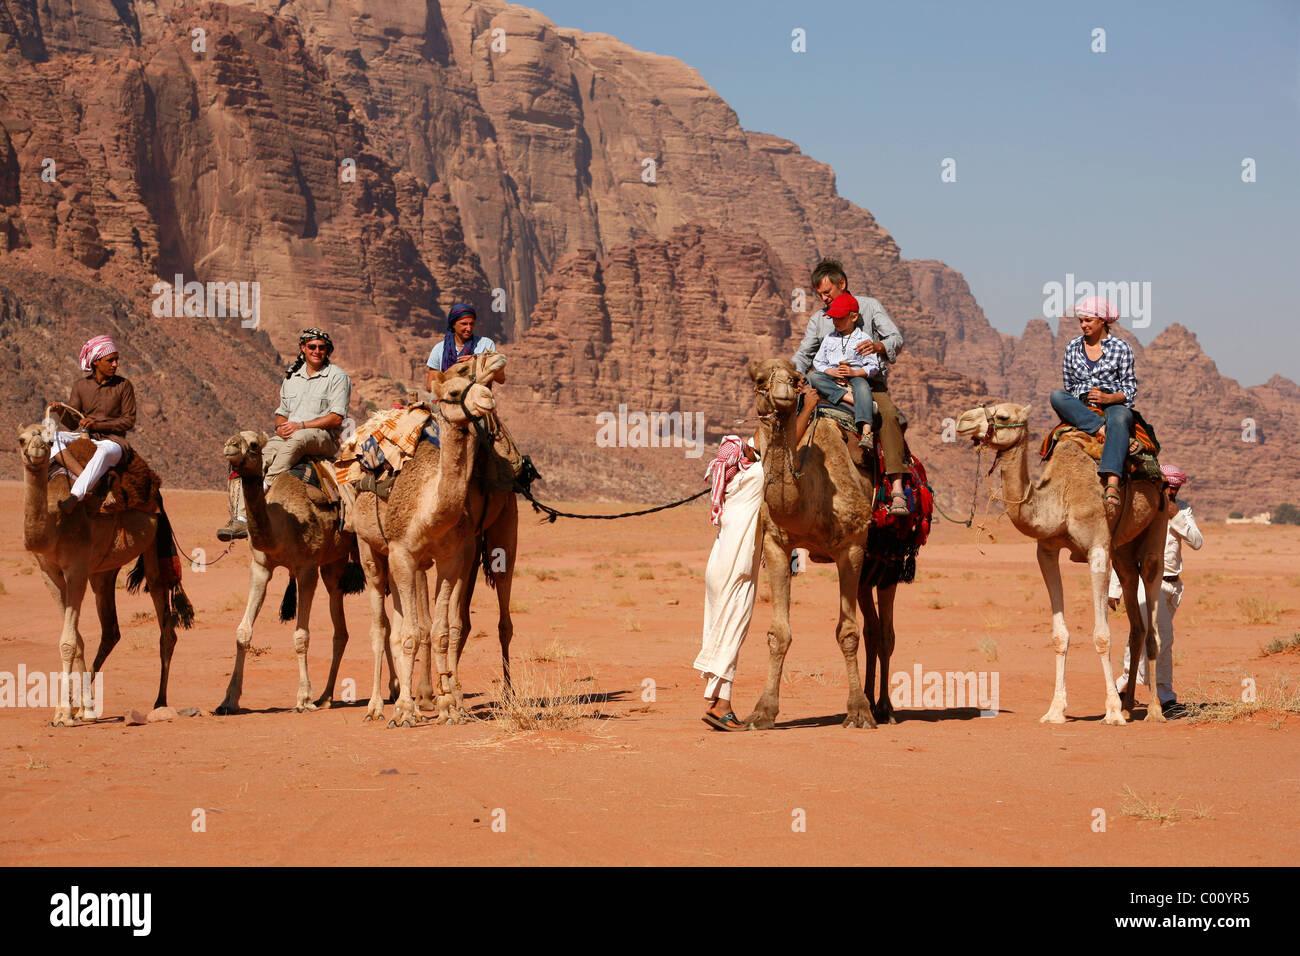 Tourists riding camels in the desert, Wadi Rum, Jordan. - Stock Image